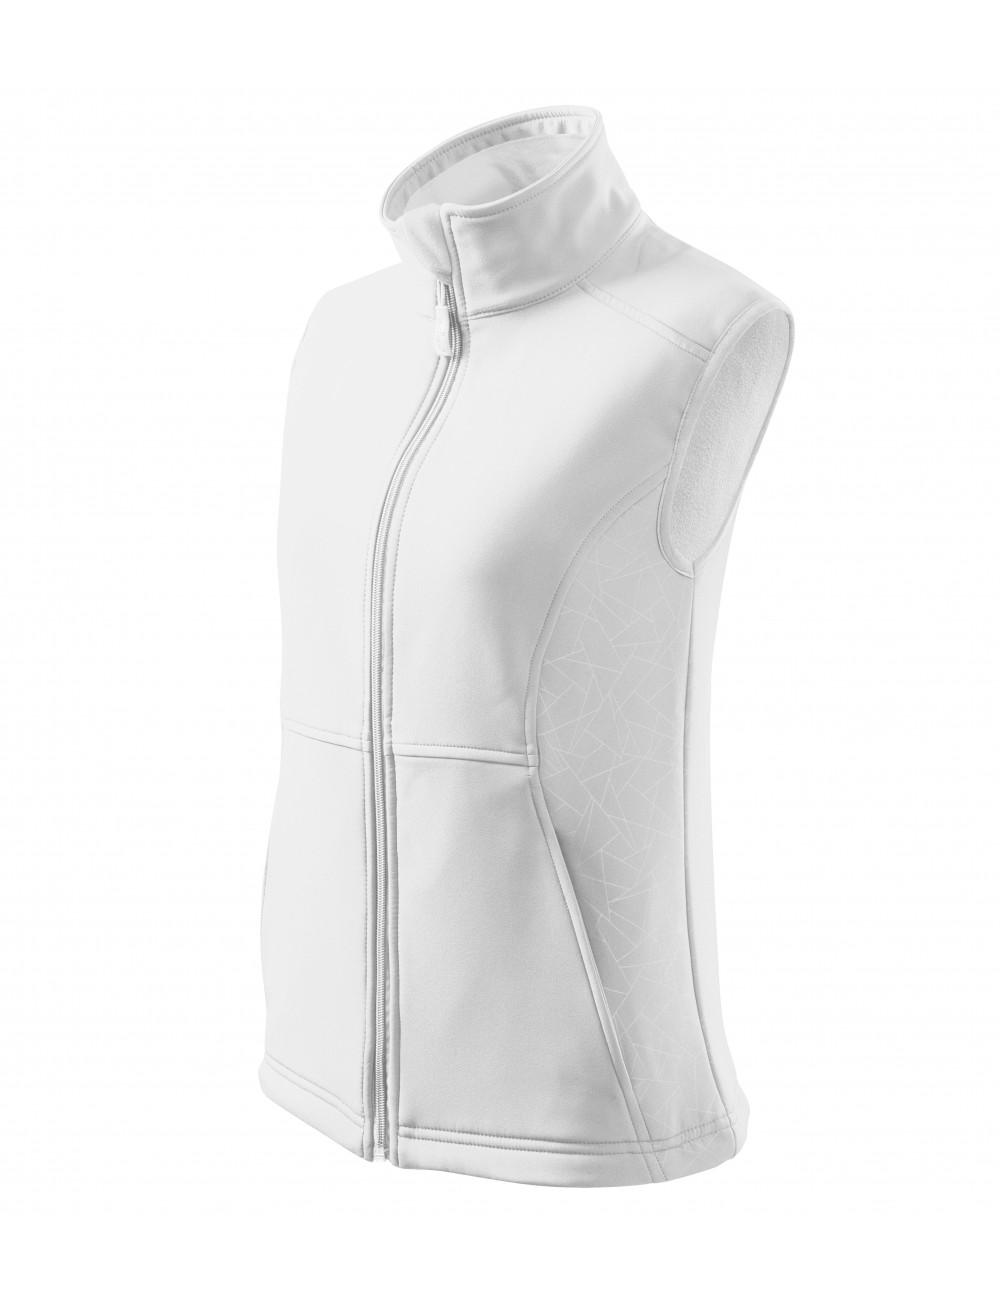 Adler MALFINI Softshell kamizelka damska Vision 516 biały